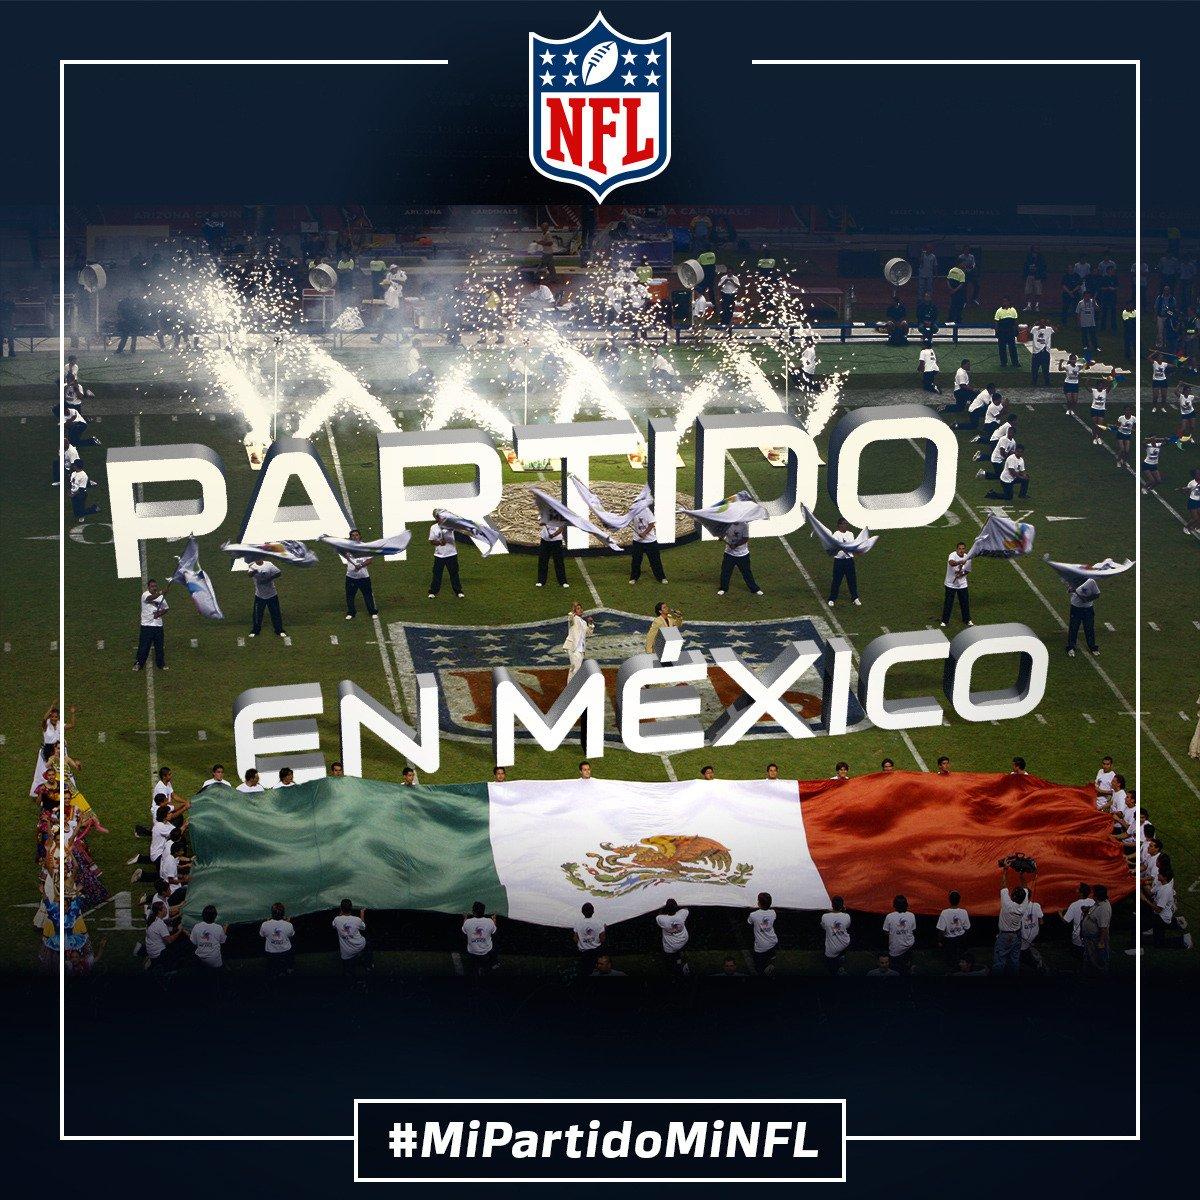 ¡YA ES OFICIAL!  Habrá partido en México.  #MiPartidoMiNFL https://t.co/aWCgsbpmjo